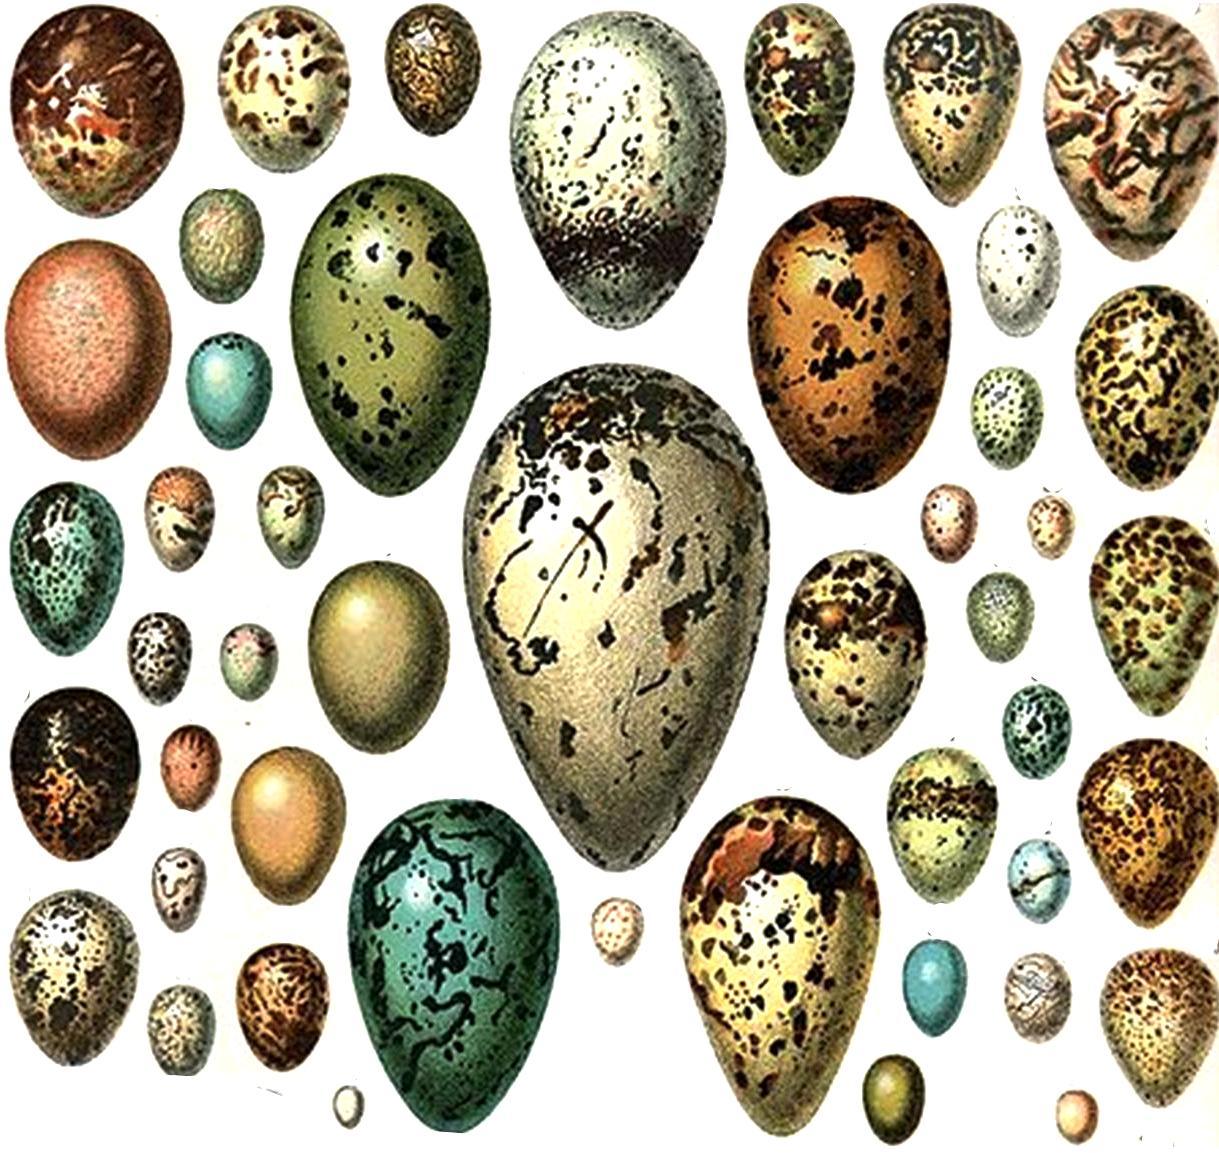 Wild Birds Unlimited How Birds Color Their Eggs